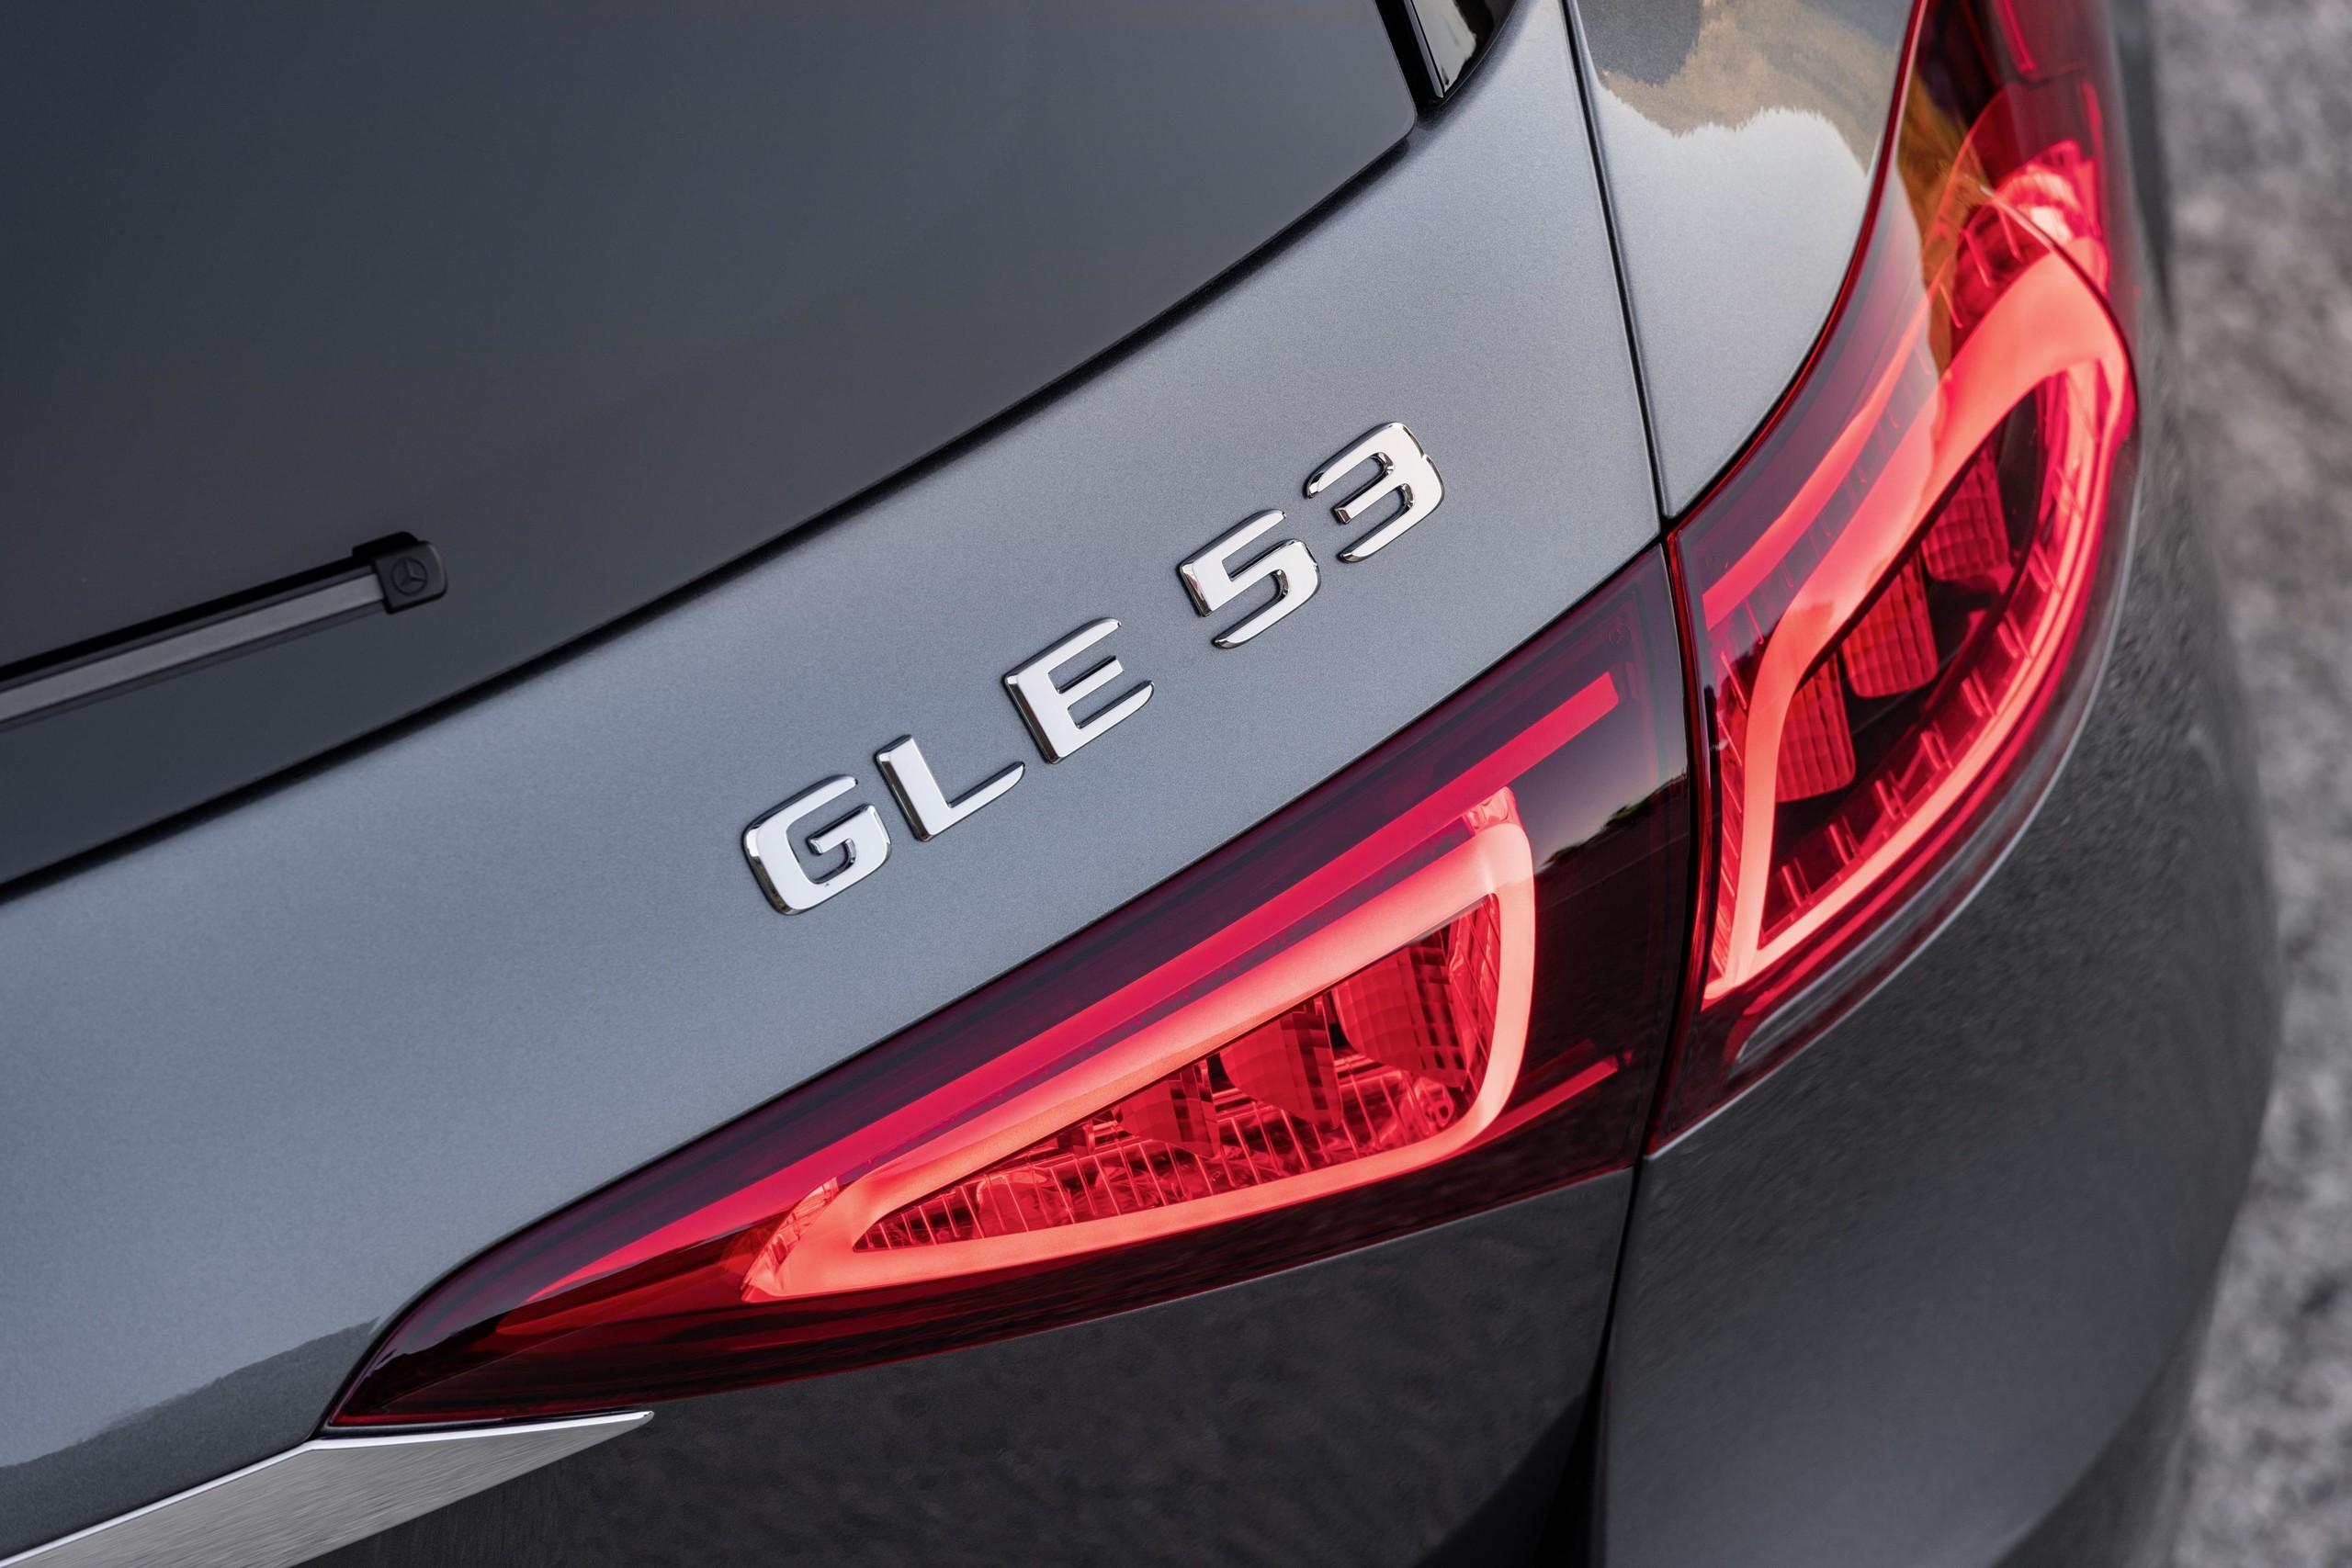 Mercedes-AMG GLE 53 4MATIC